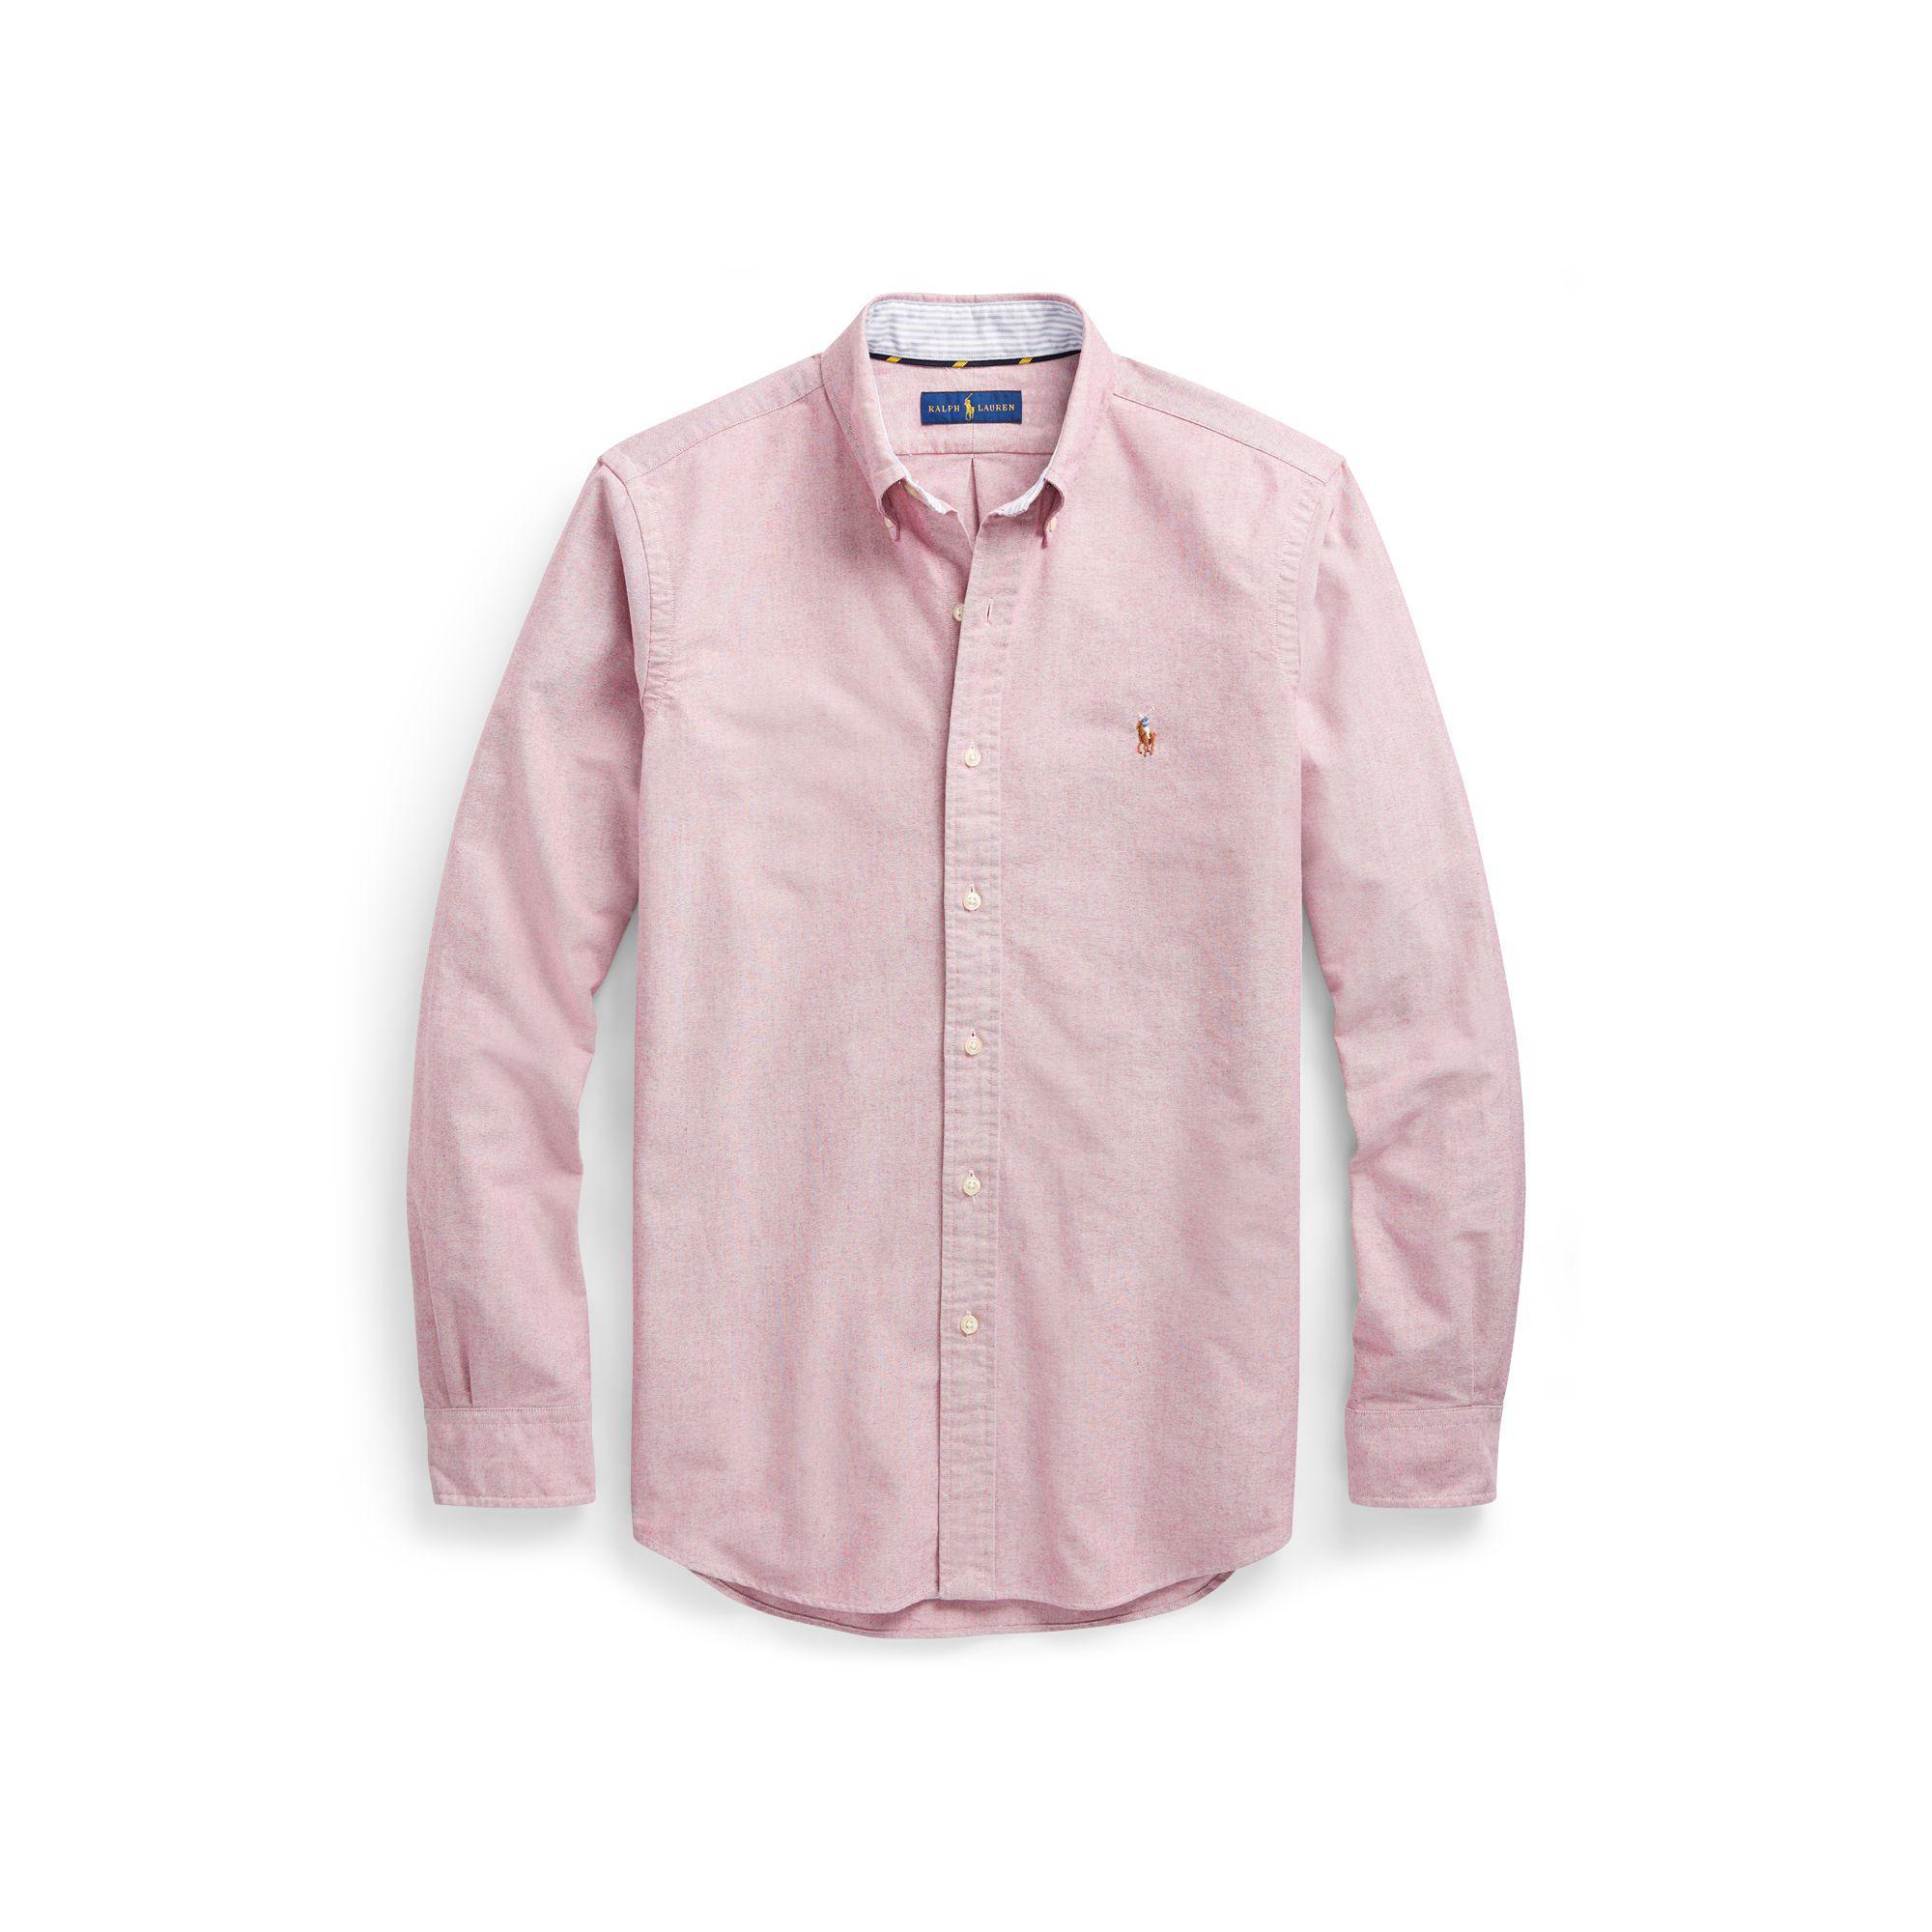 a82cd261f2d4bc Polo Ralph Lauren Classic Fit Oxford Shirt for Men - Lyst